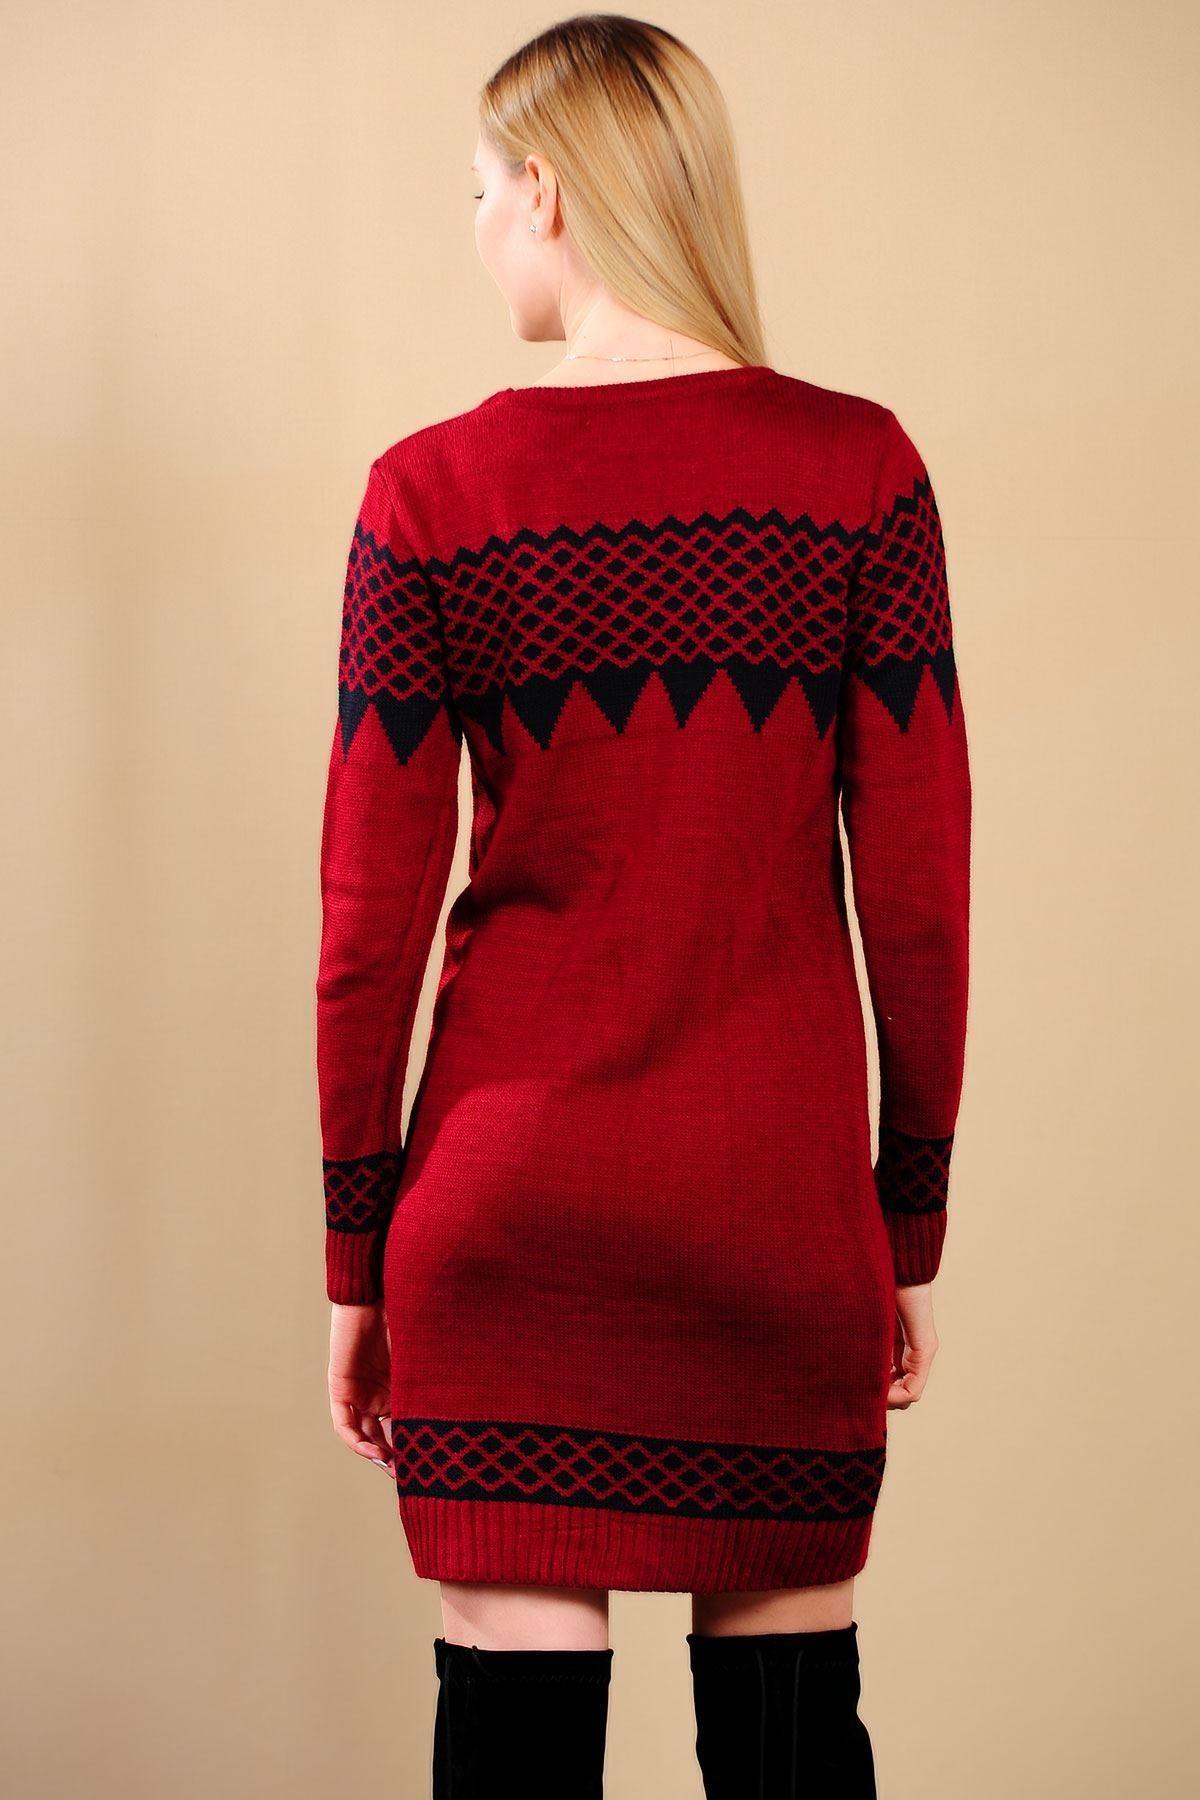 Siyah Desen Detay Kırmızı Bayan Triko